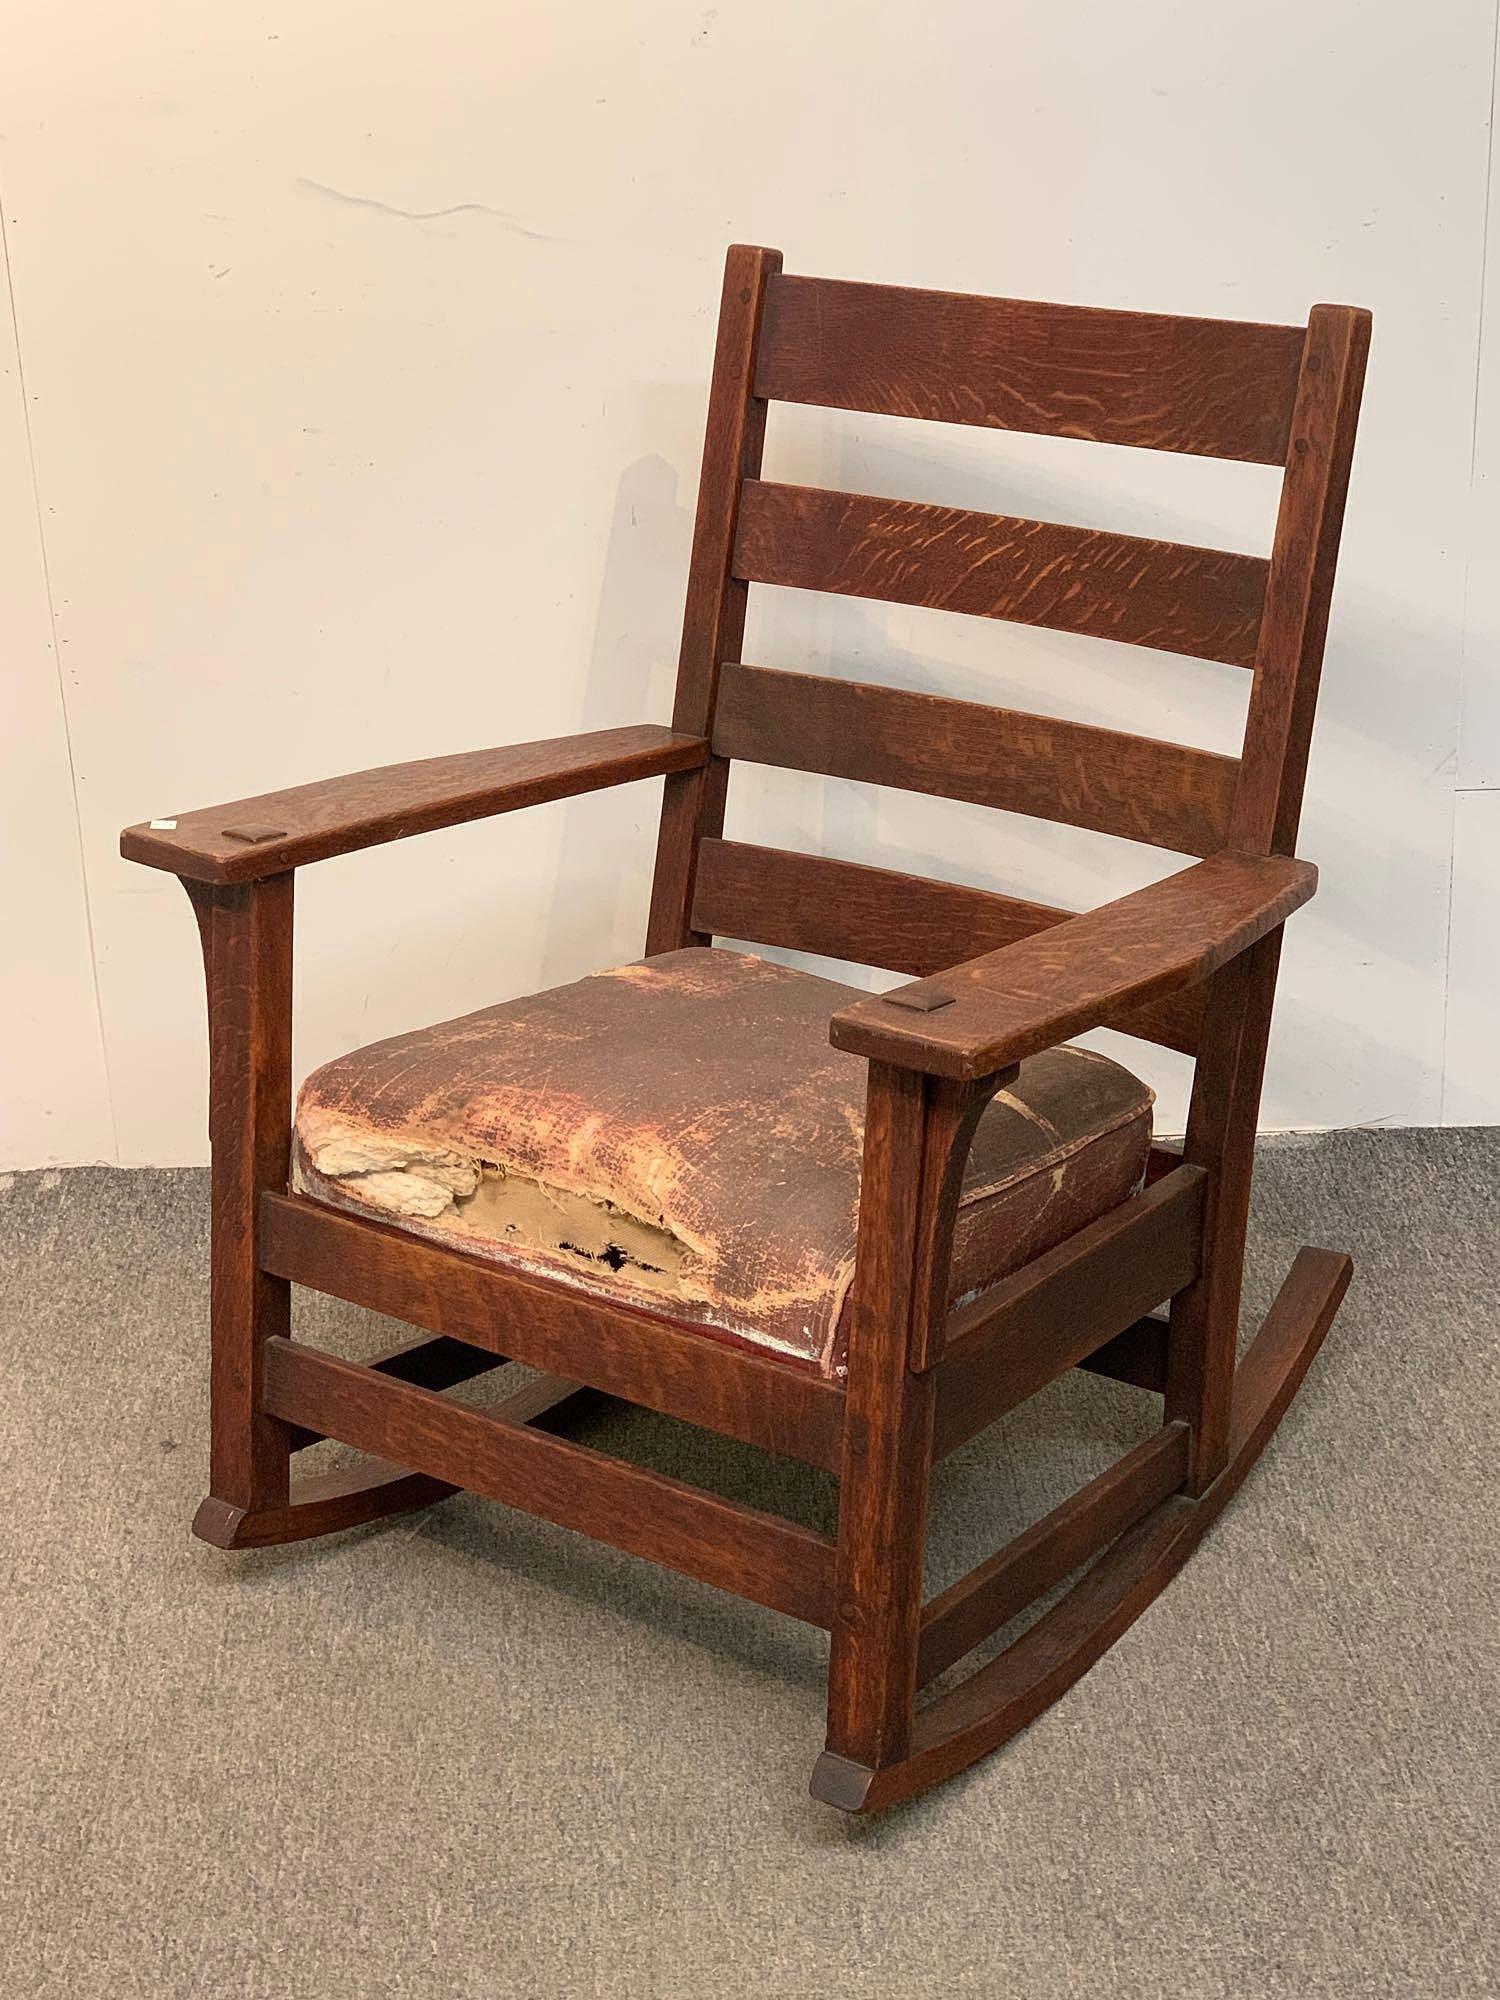 L & JG Stickley Oak Rocking Chair